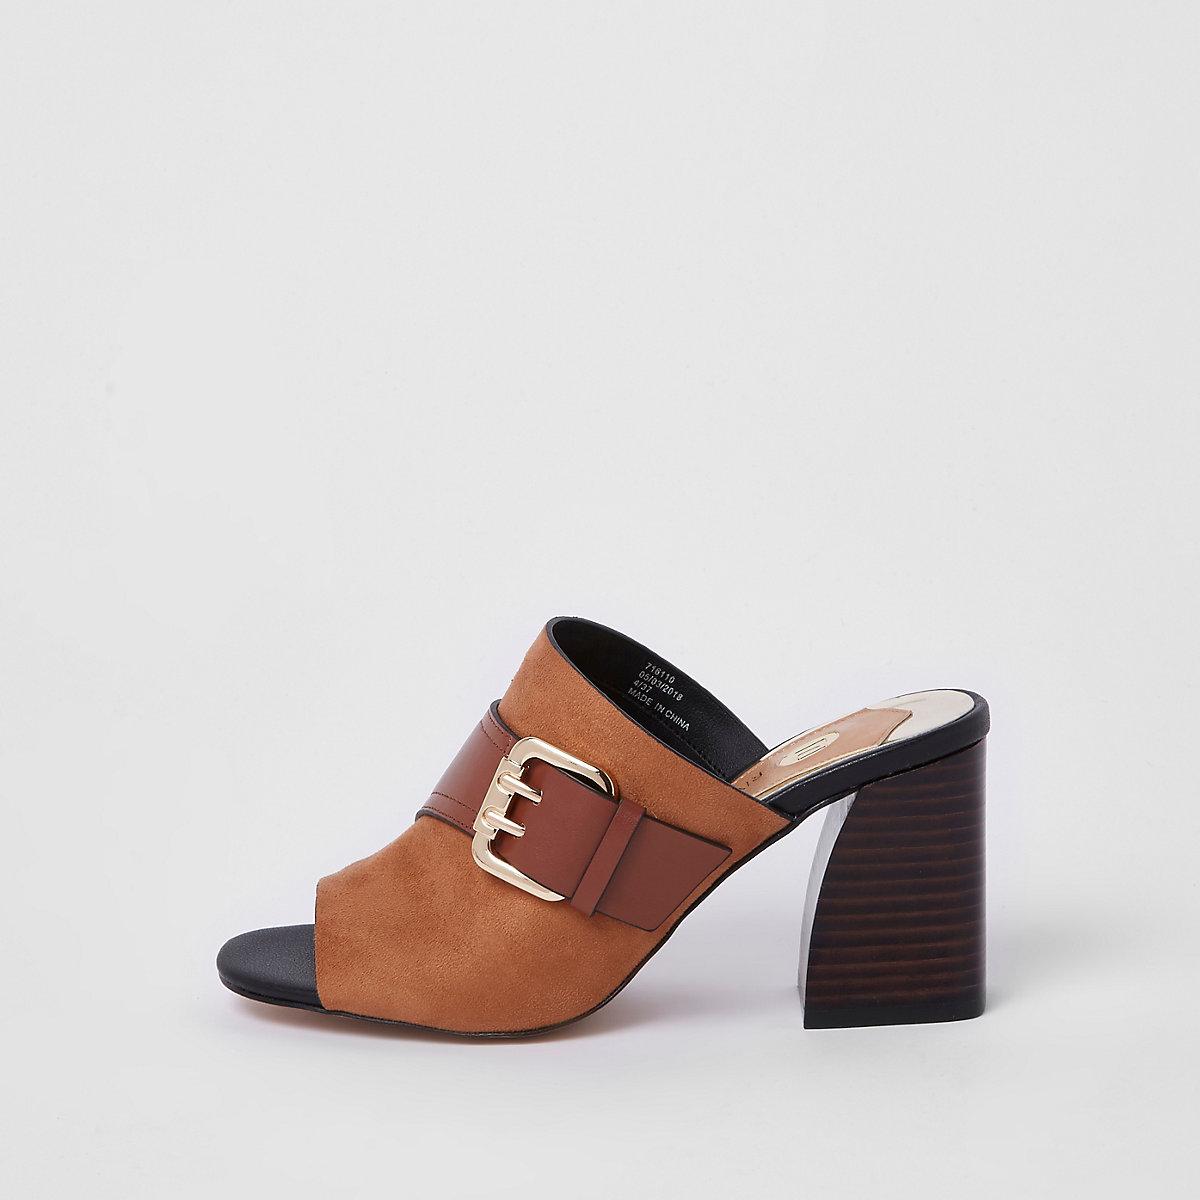 Tan buckle block heel mules